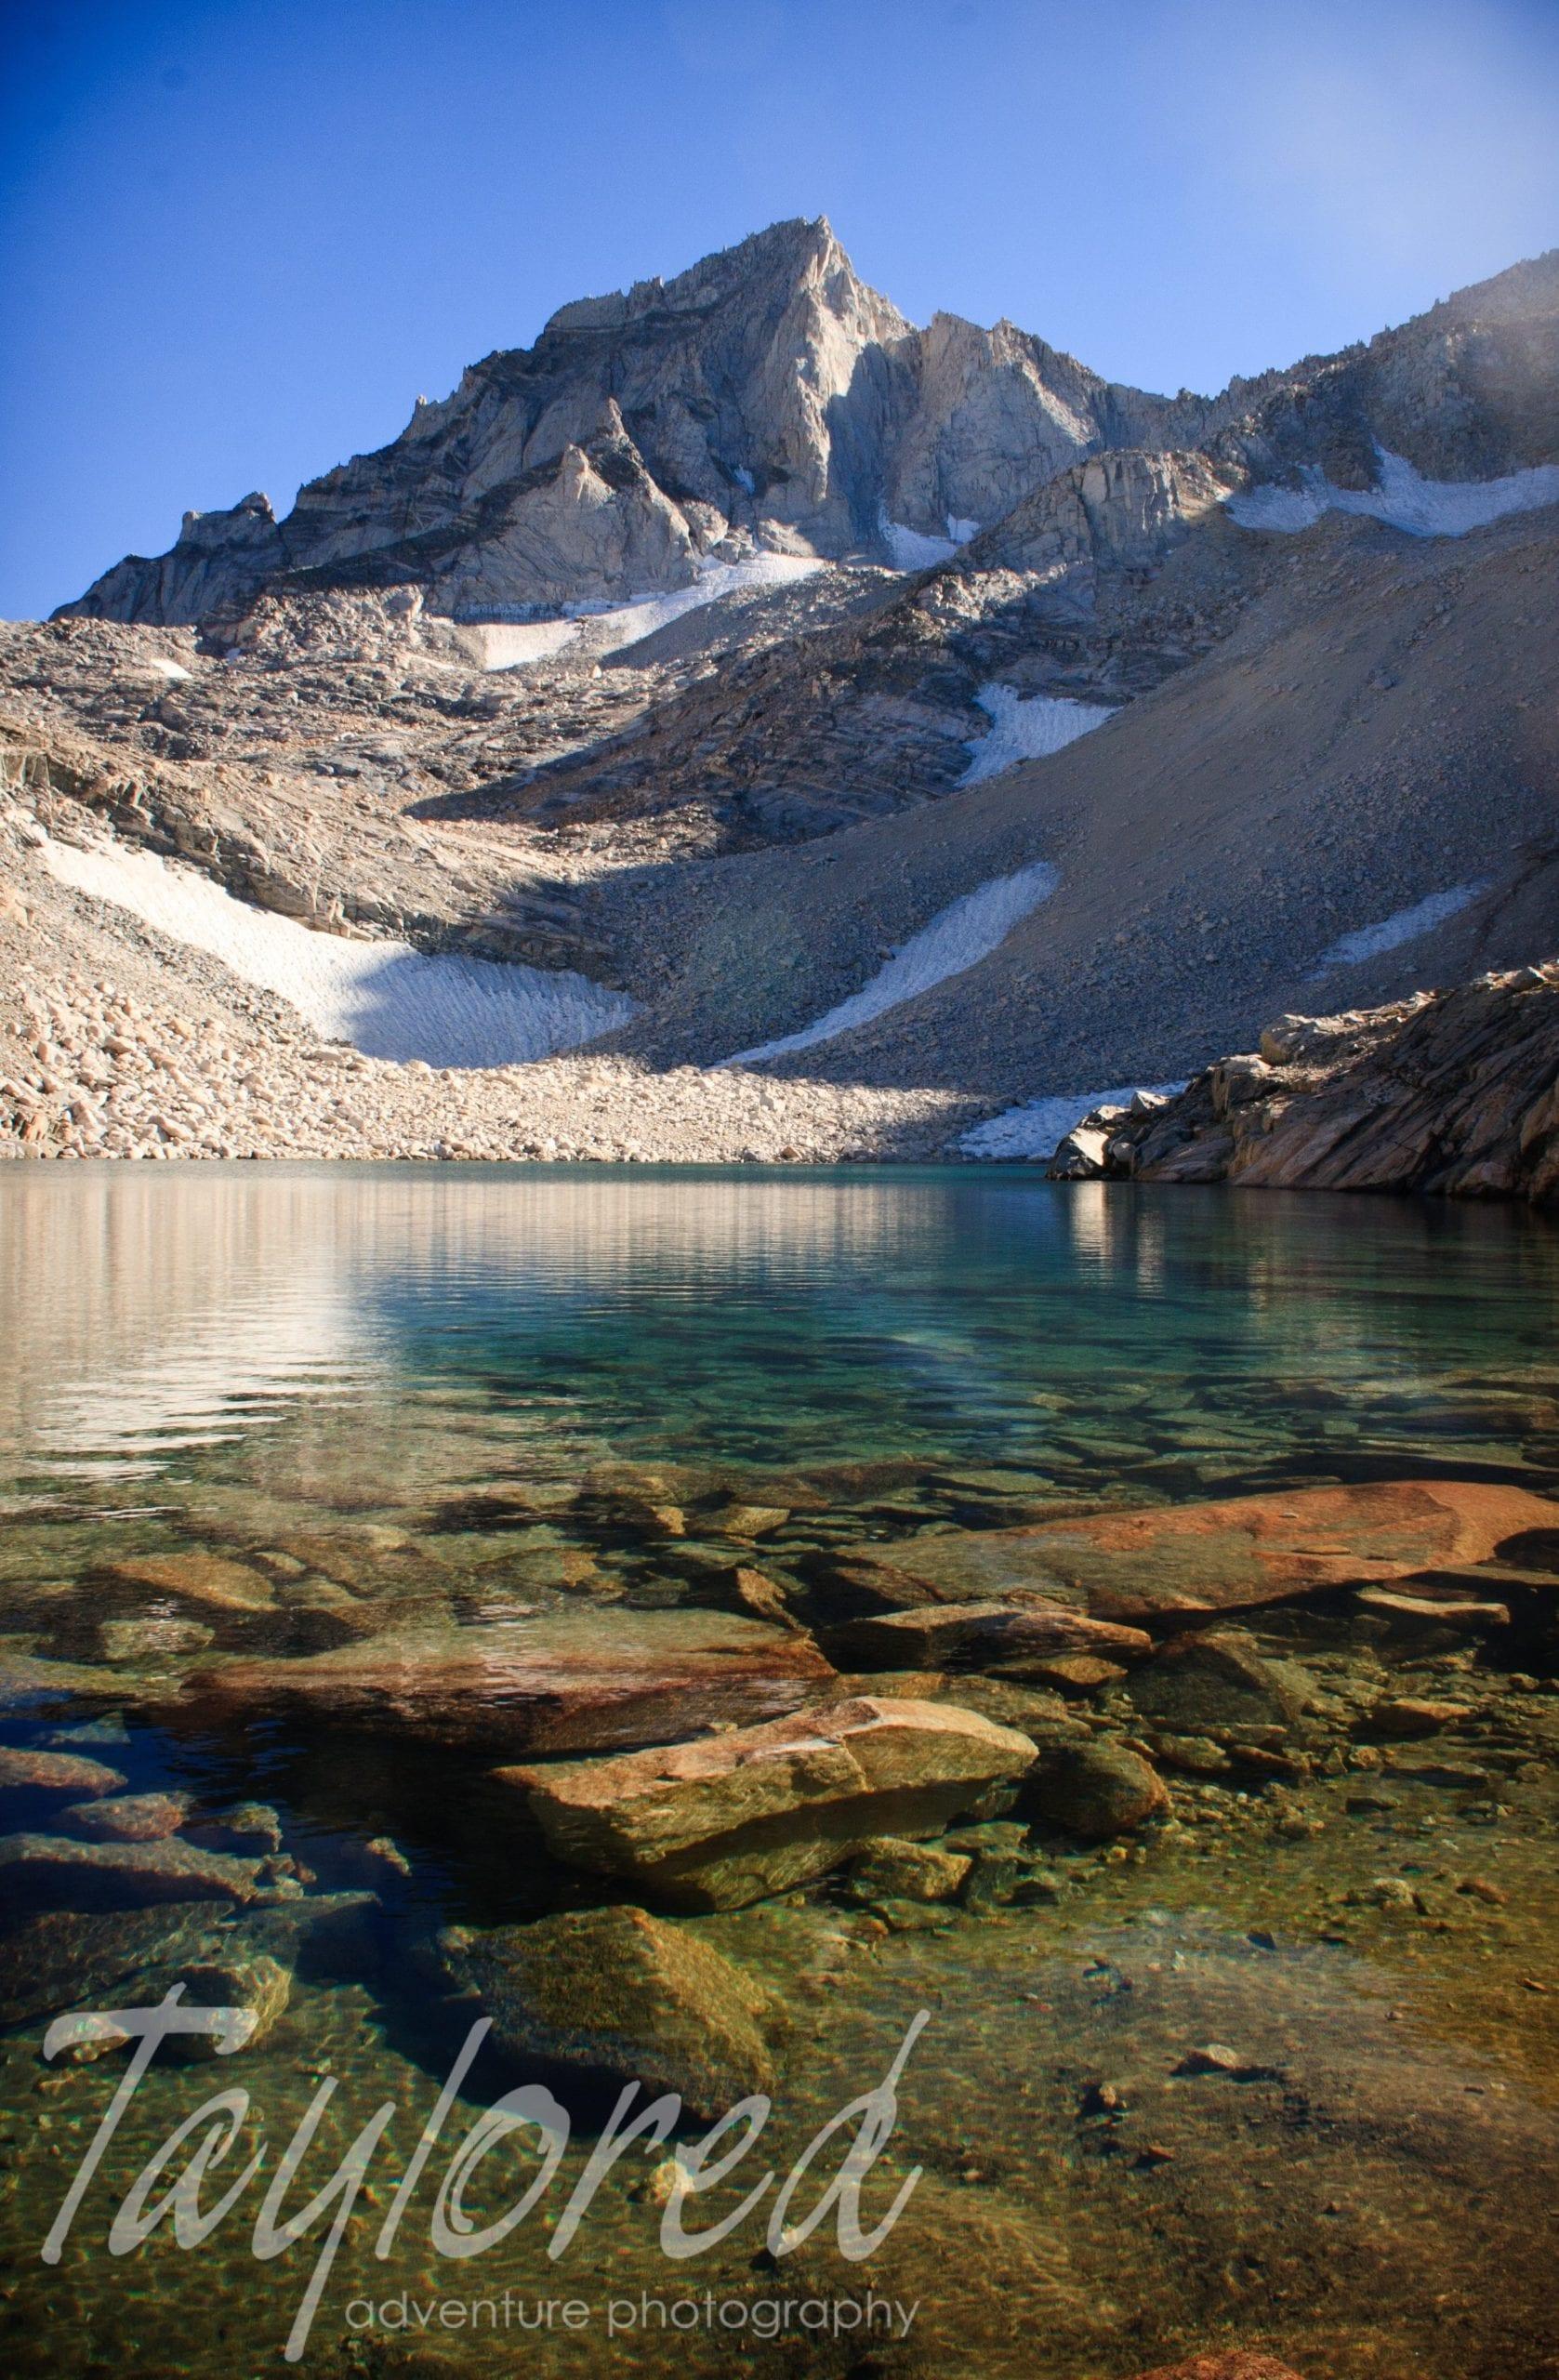 Taylored Photo Memories Adventure Photographer bear creek spire